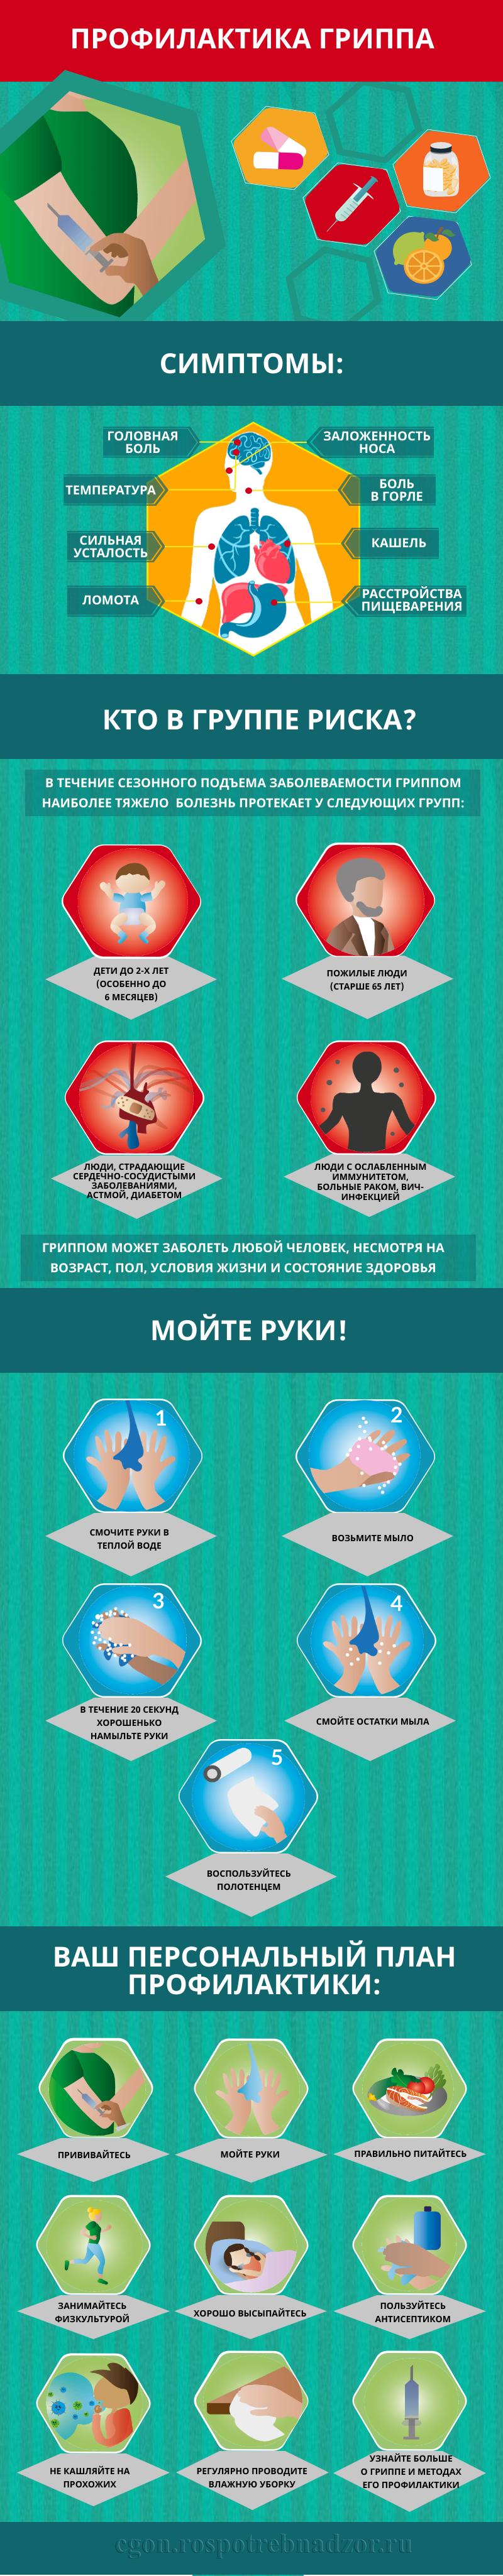 PROFILAKTIKA-GRIPPA.png